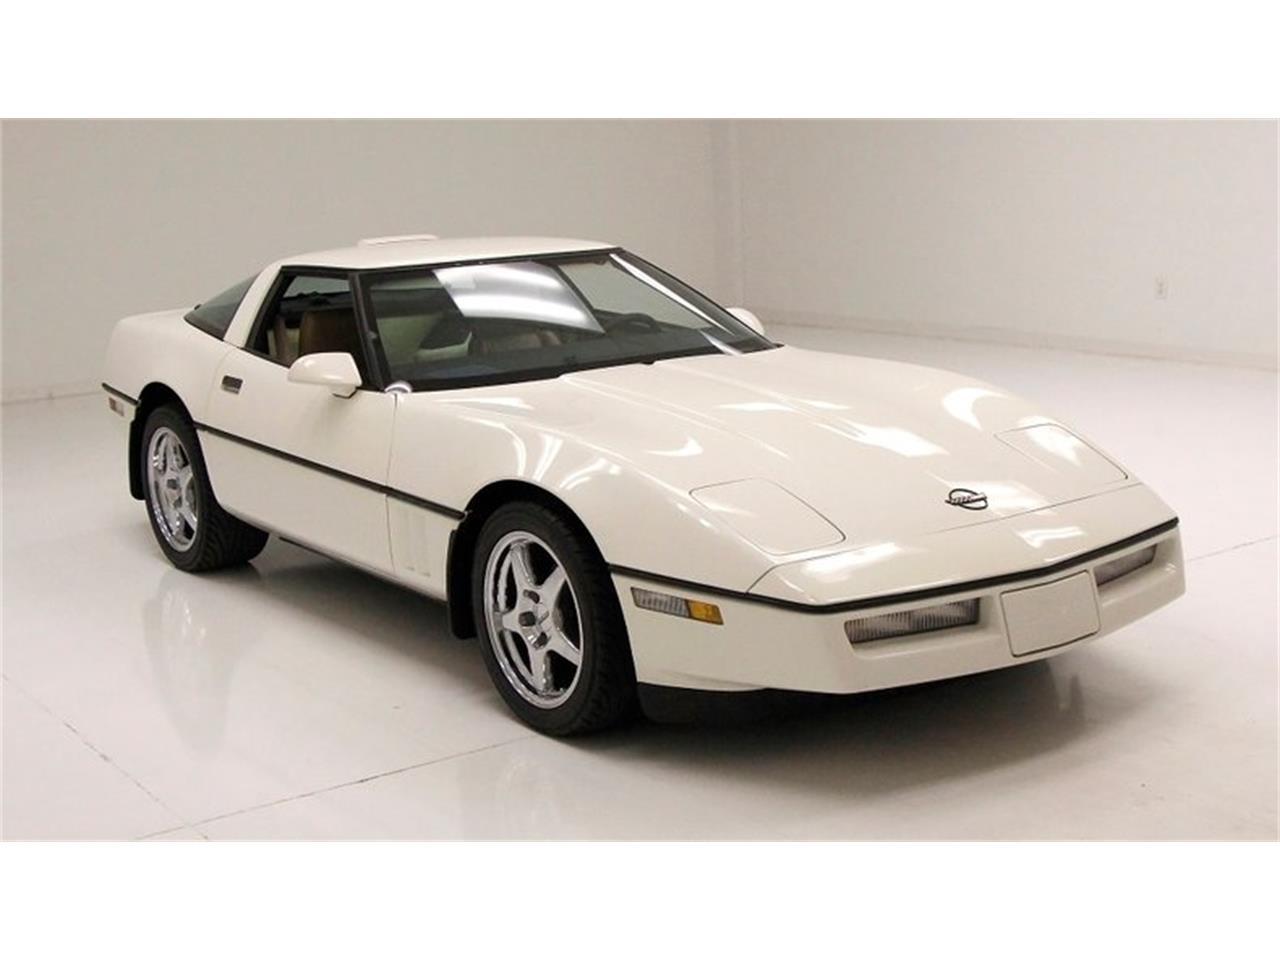 1986 Chevrolet Corvette (CC-1234287) for sale in Morgantown, Pennsylvania